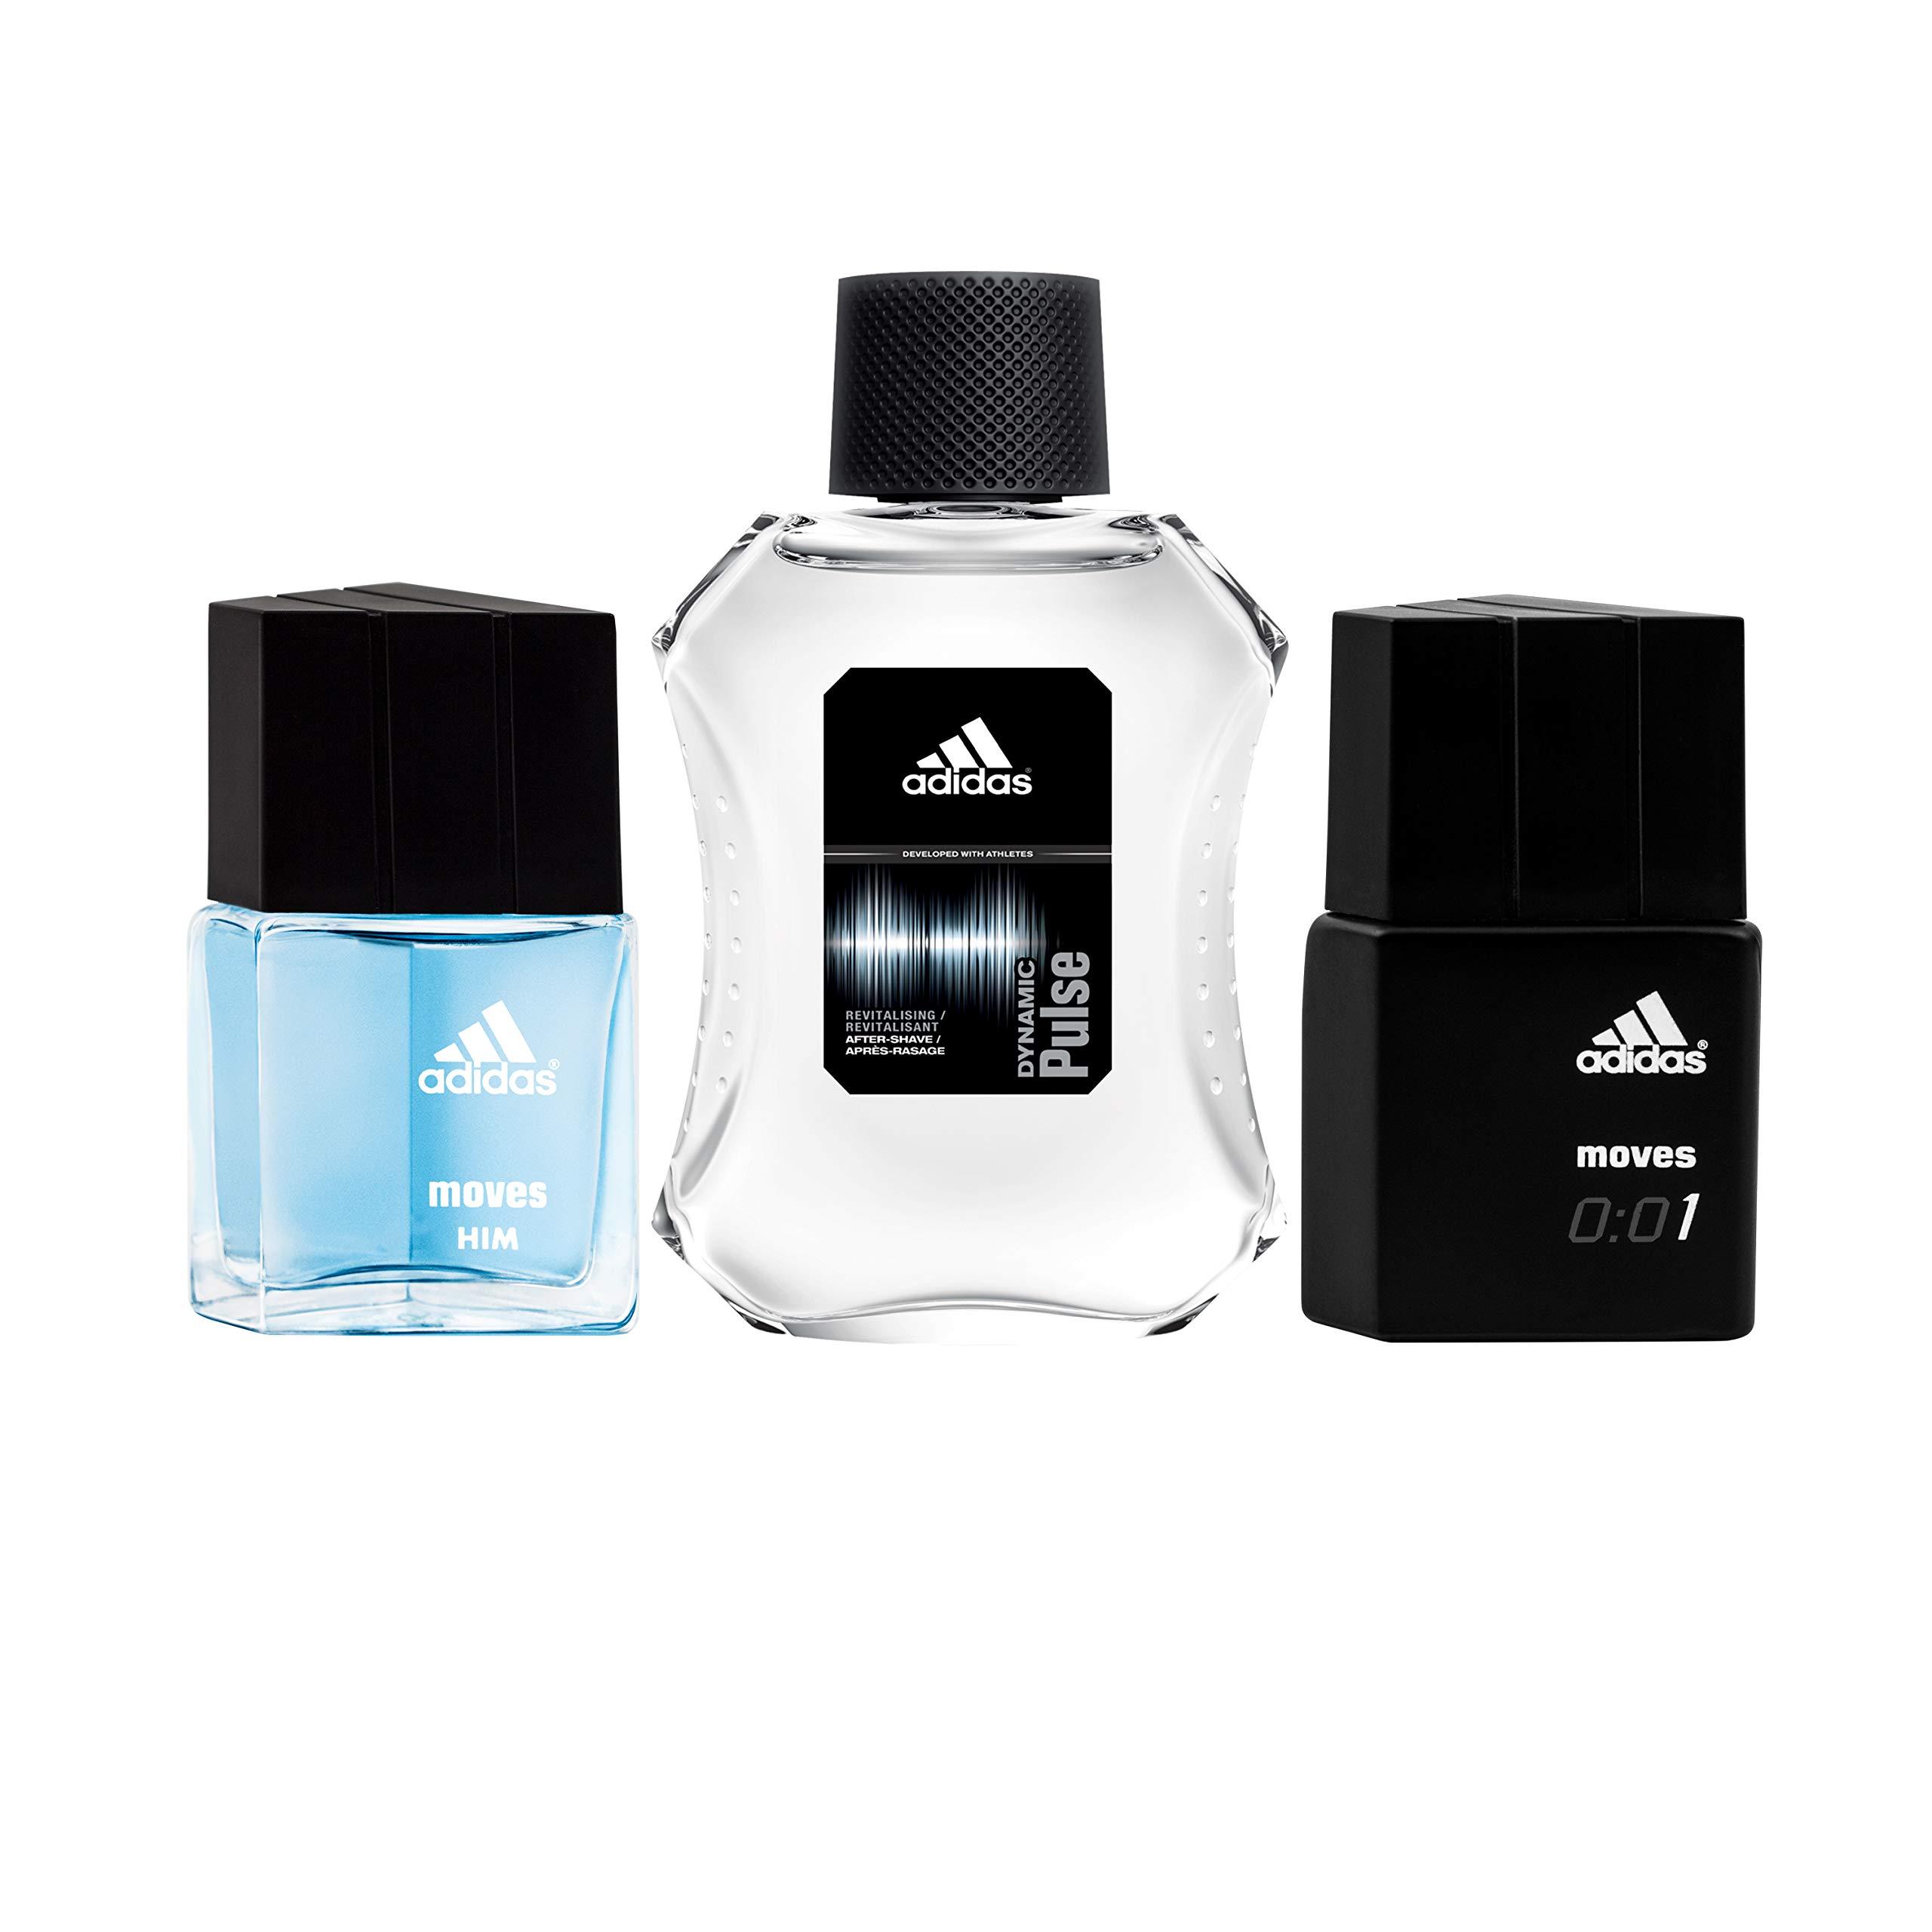 bfbf3727f75c Amazon.com: adidas Omni Male 3 Piece Gift Set: Beauty